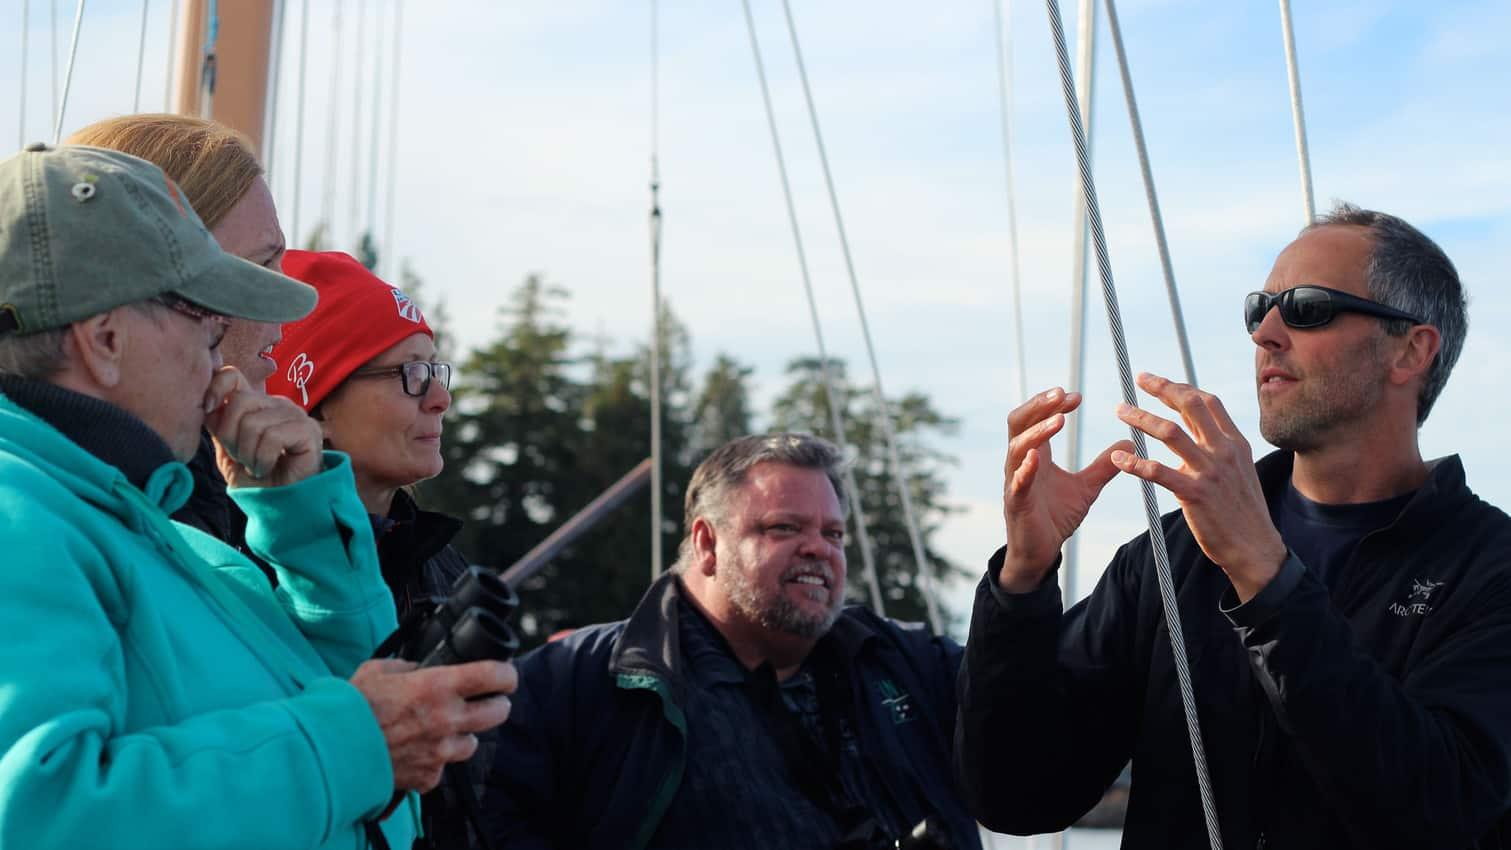 Captain Markel teaching passengers